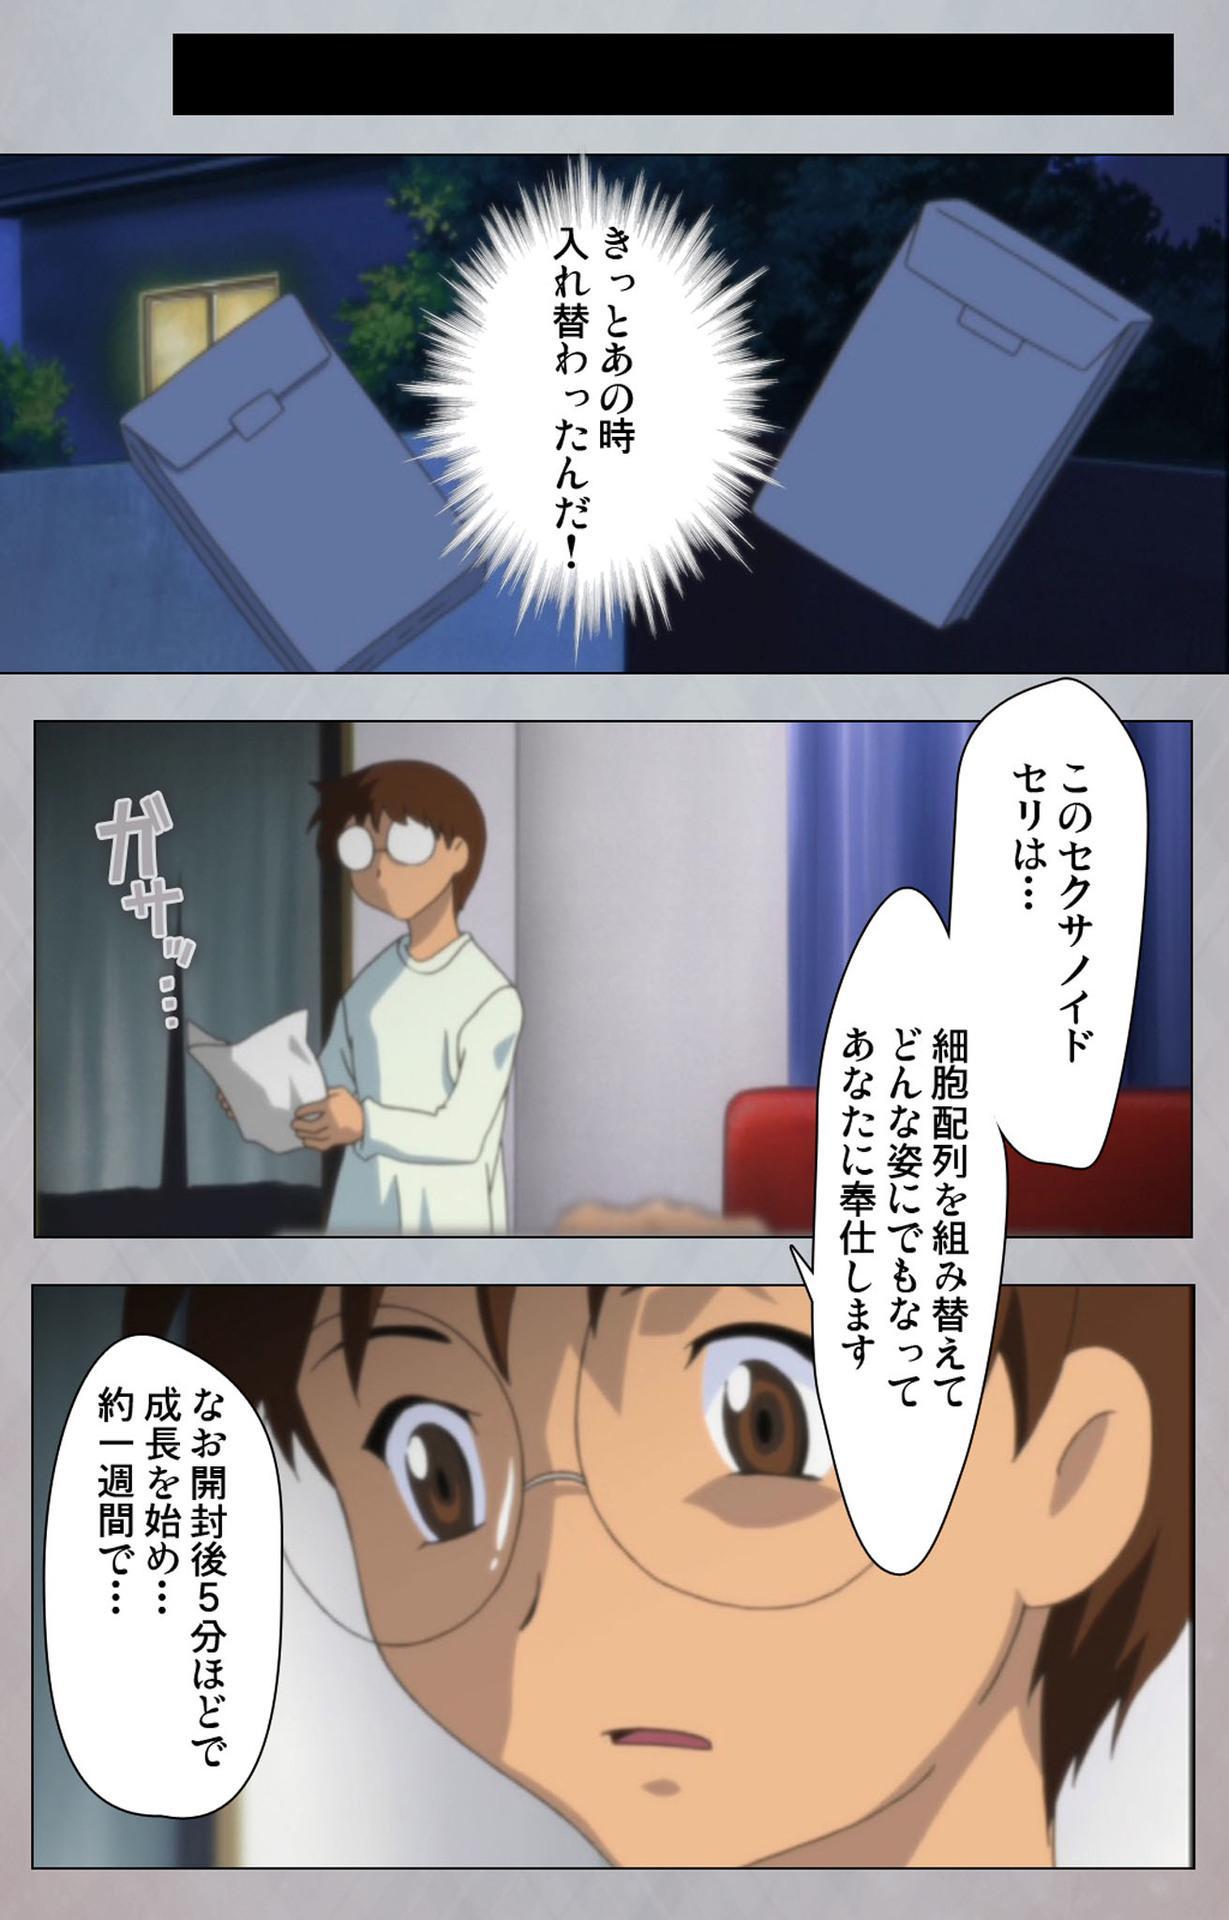 [Digital Works] [Full Color Seijin Ban] Sex Android ~Risou no Onna de Nuite yaru~ Kanzenban 26